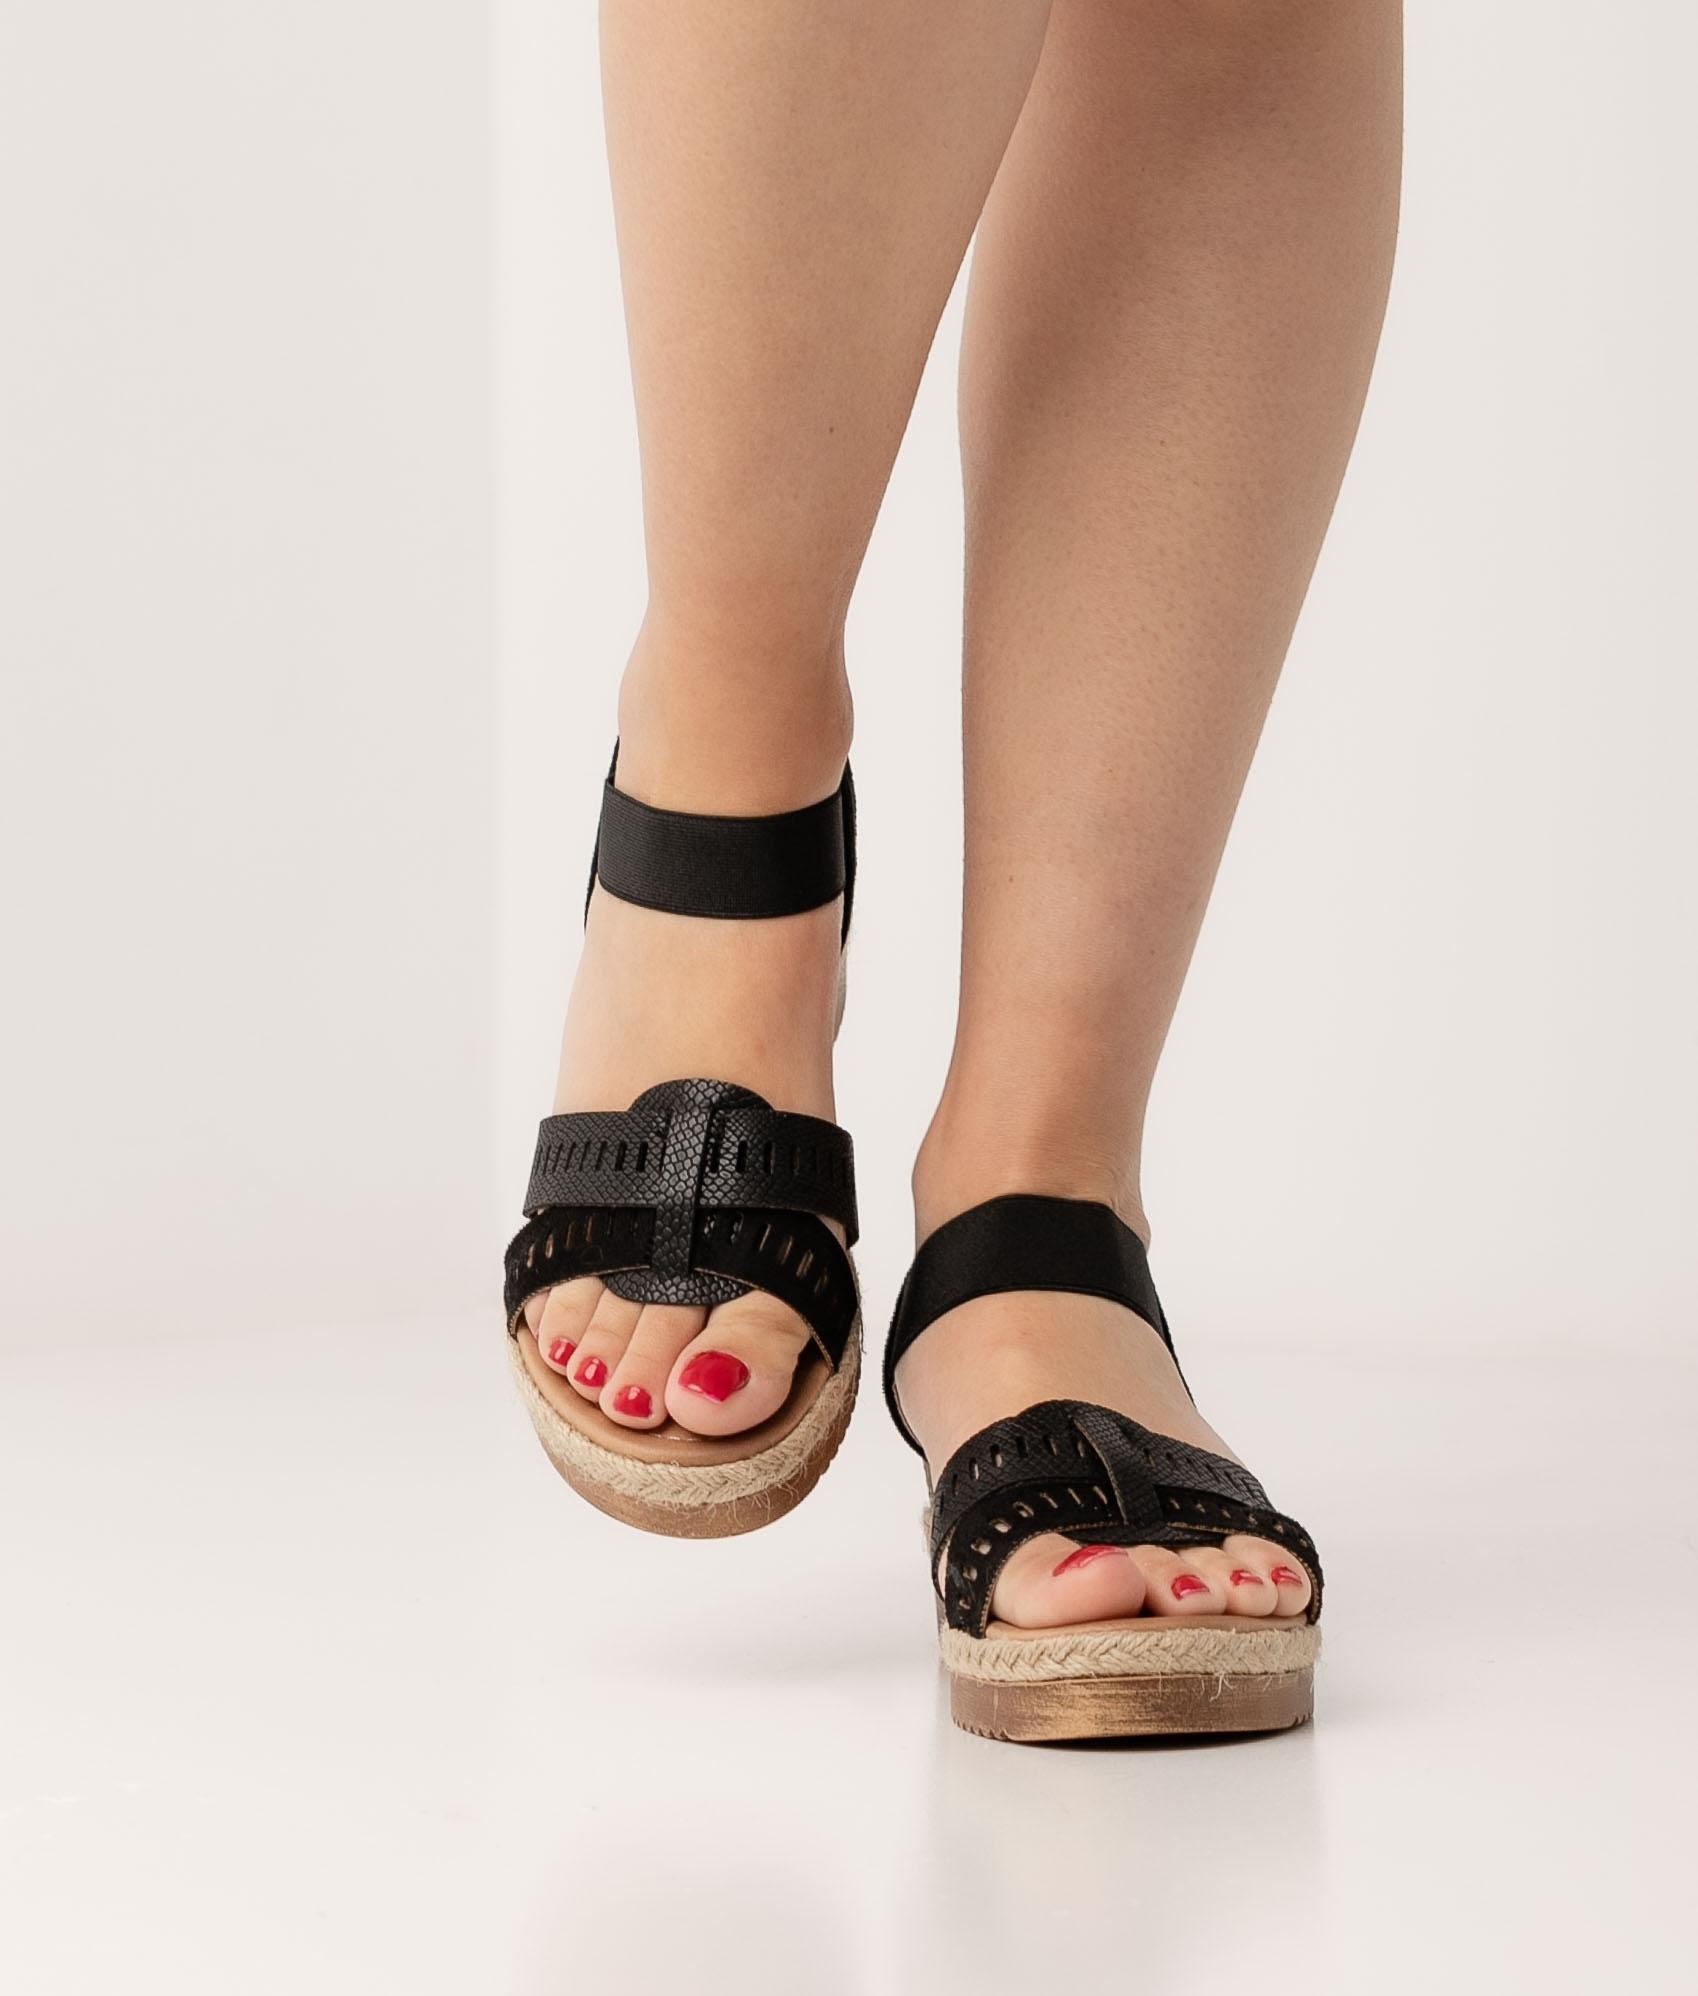 Wedge Heel Semper - Black